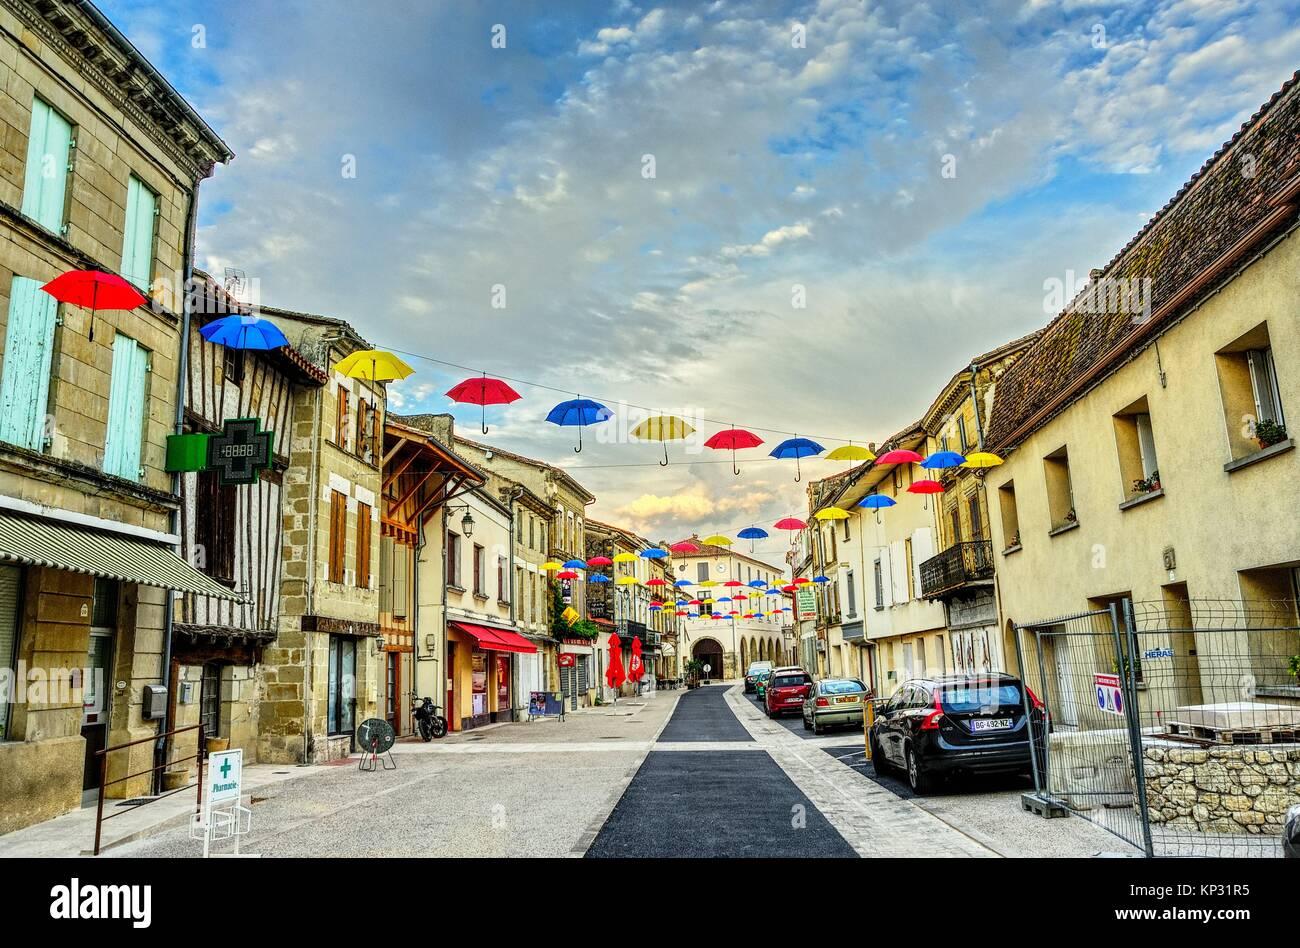 Rue Marcel Herve decorated for annual Gasconnade Festival, Lauzun, Lot-et-Garonne Department, New Aquitaine, France. - Stock Image